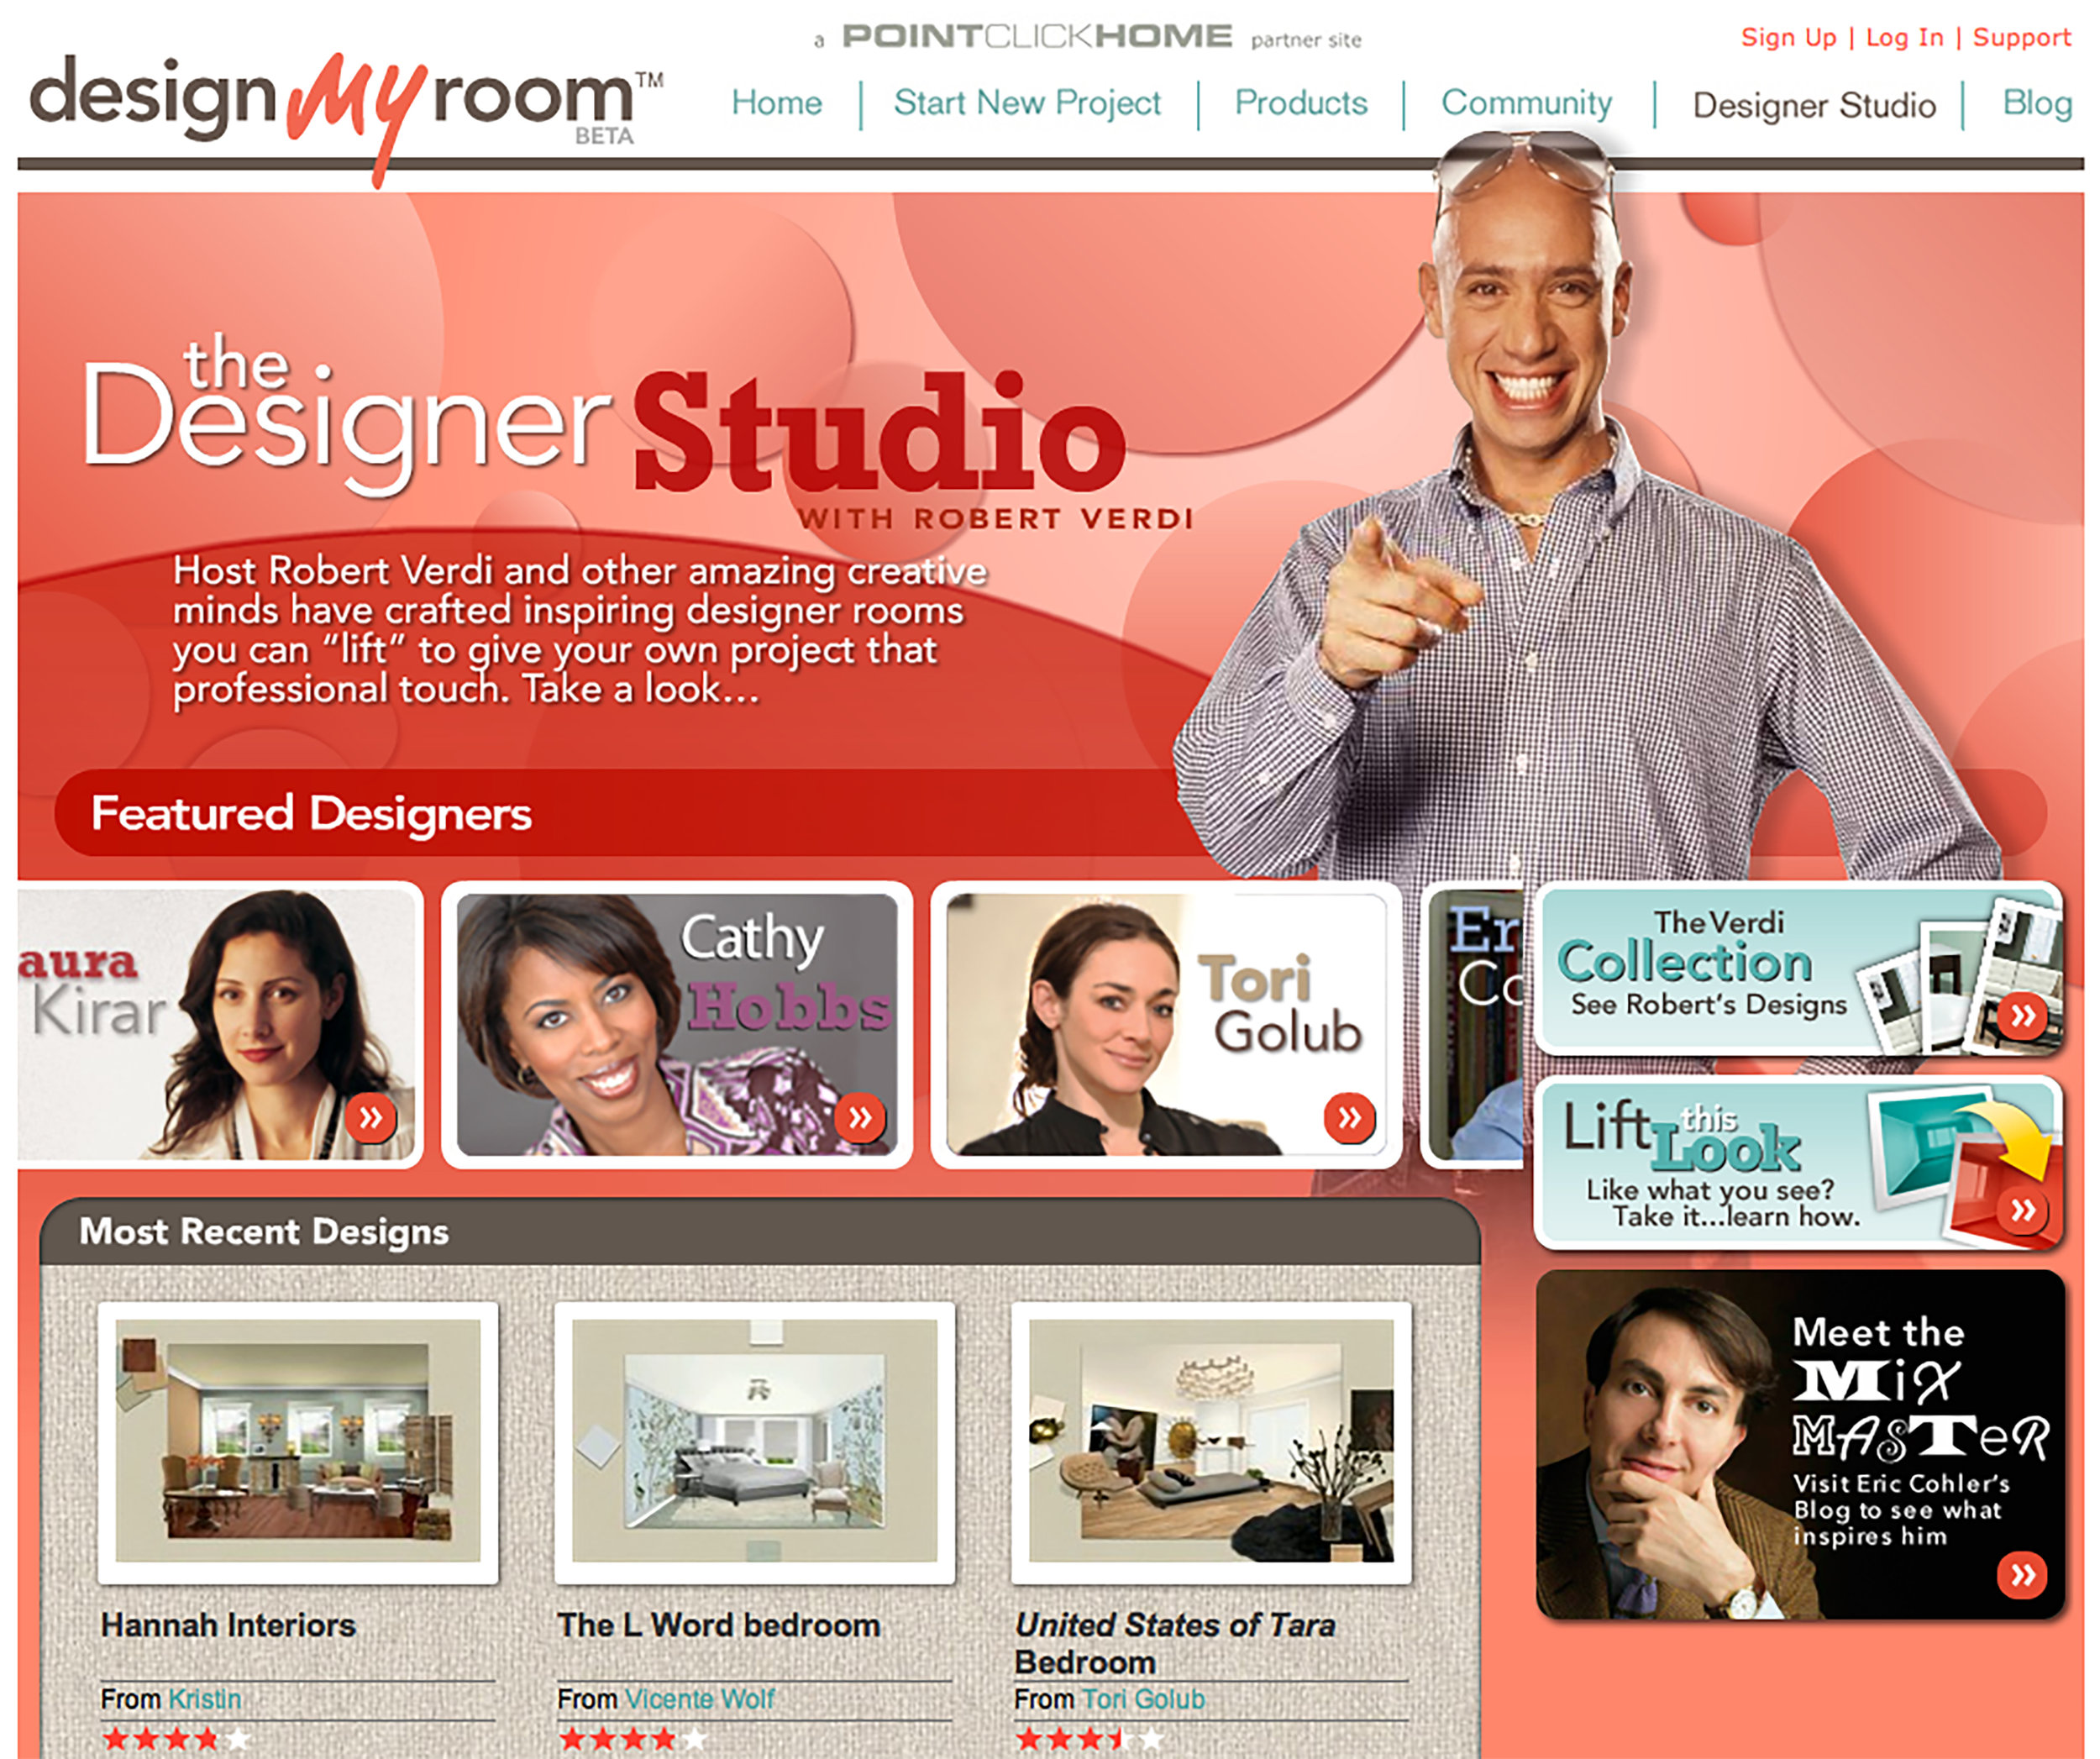 design my room_web_2.jpg